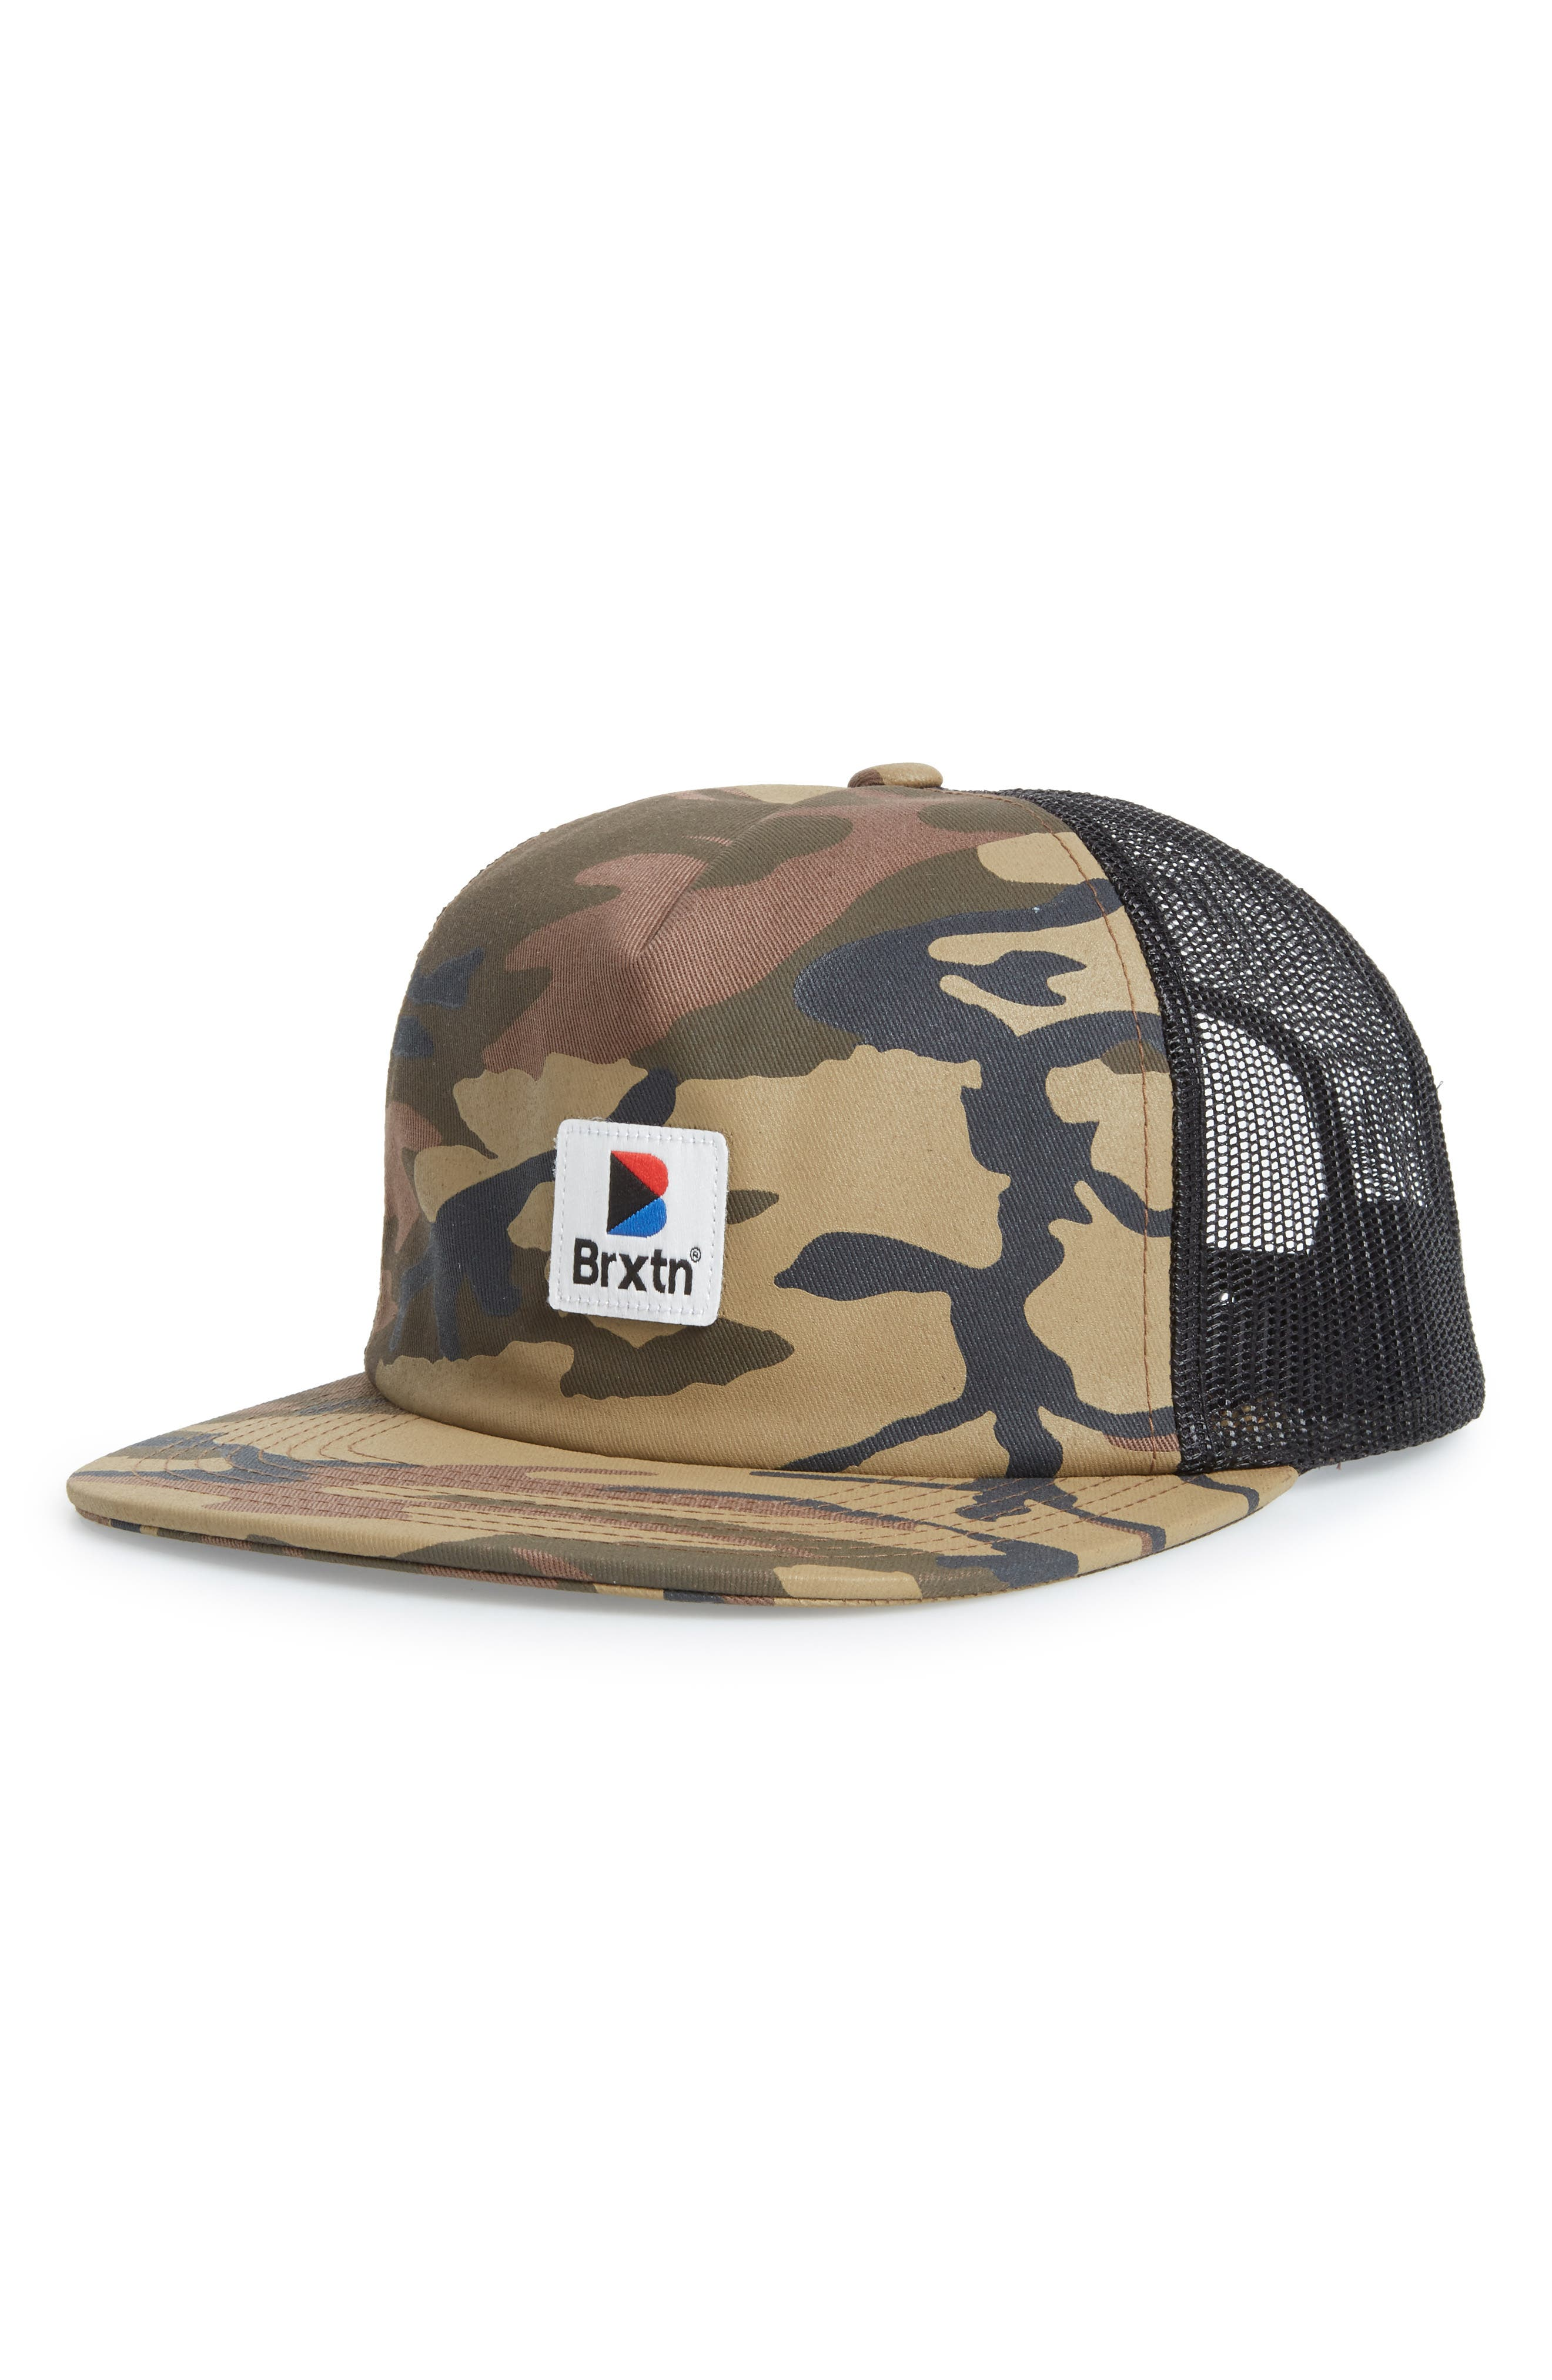 Stowell Camo Baseball Cap,                         Main,                         color, Camo